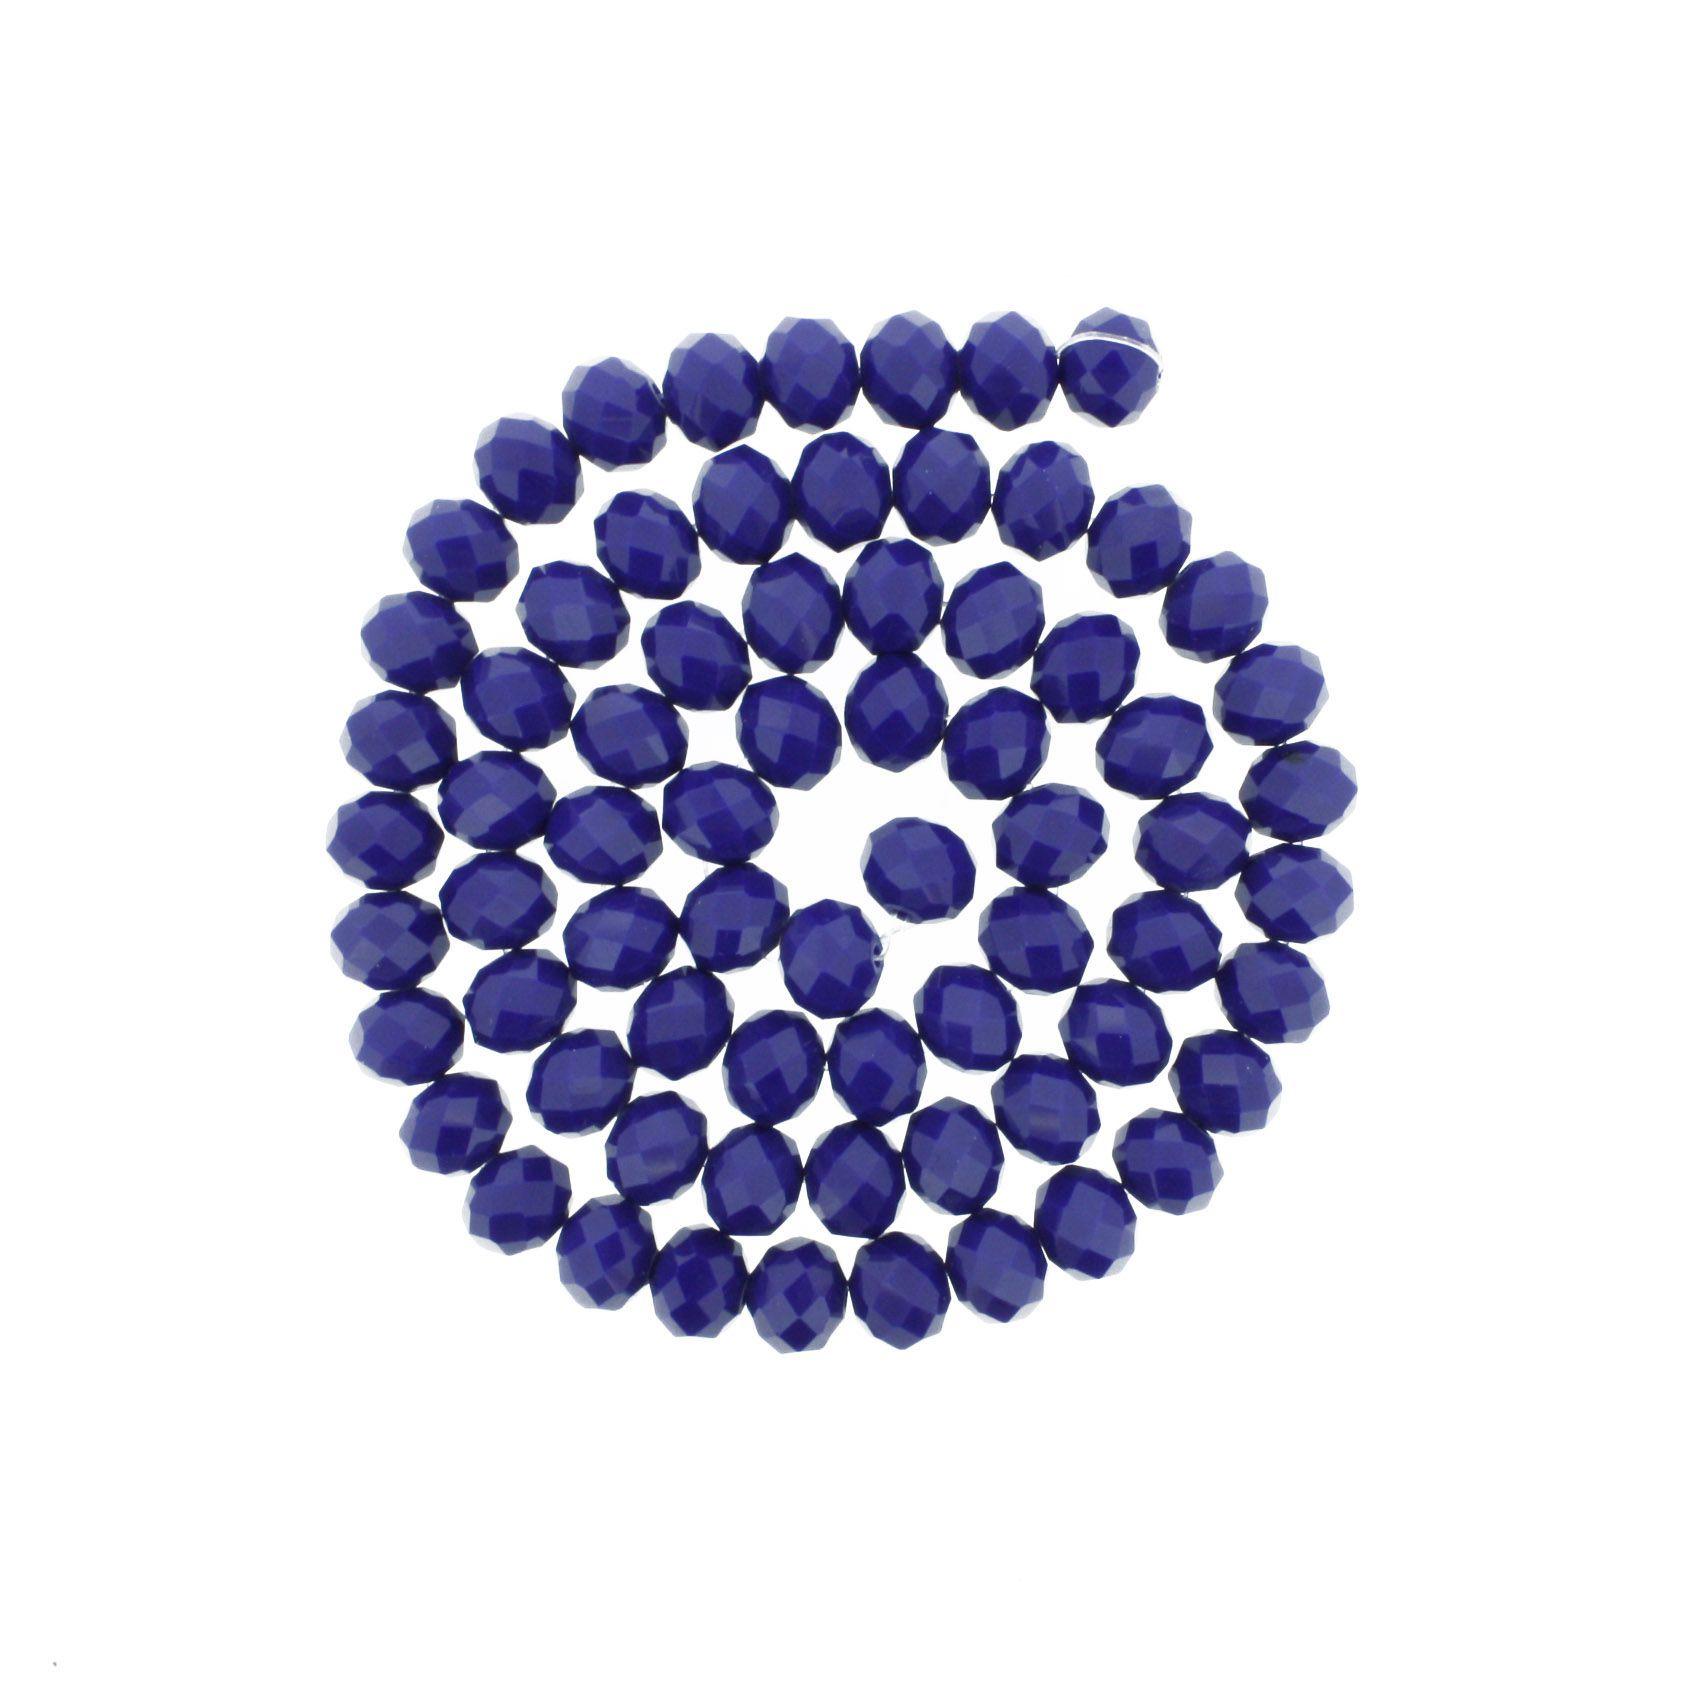 Fio de Cristal - Piatto® - Azul Royal - 10mm  - Universo Religioso® - Artigos de Umbanda e Candomblé